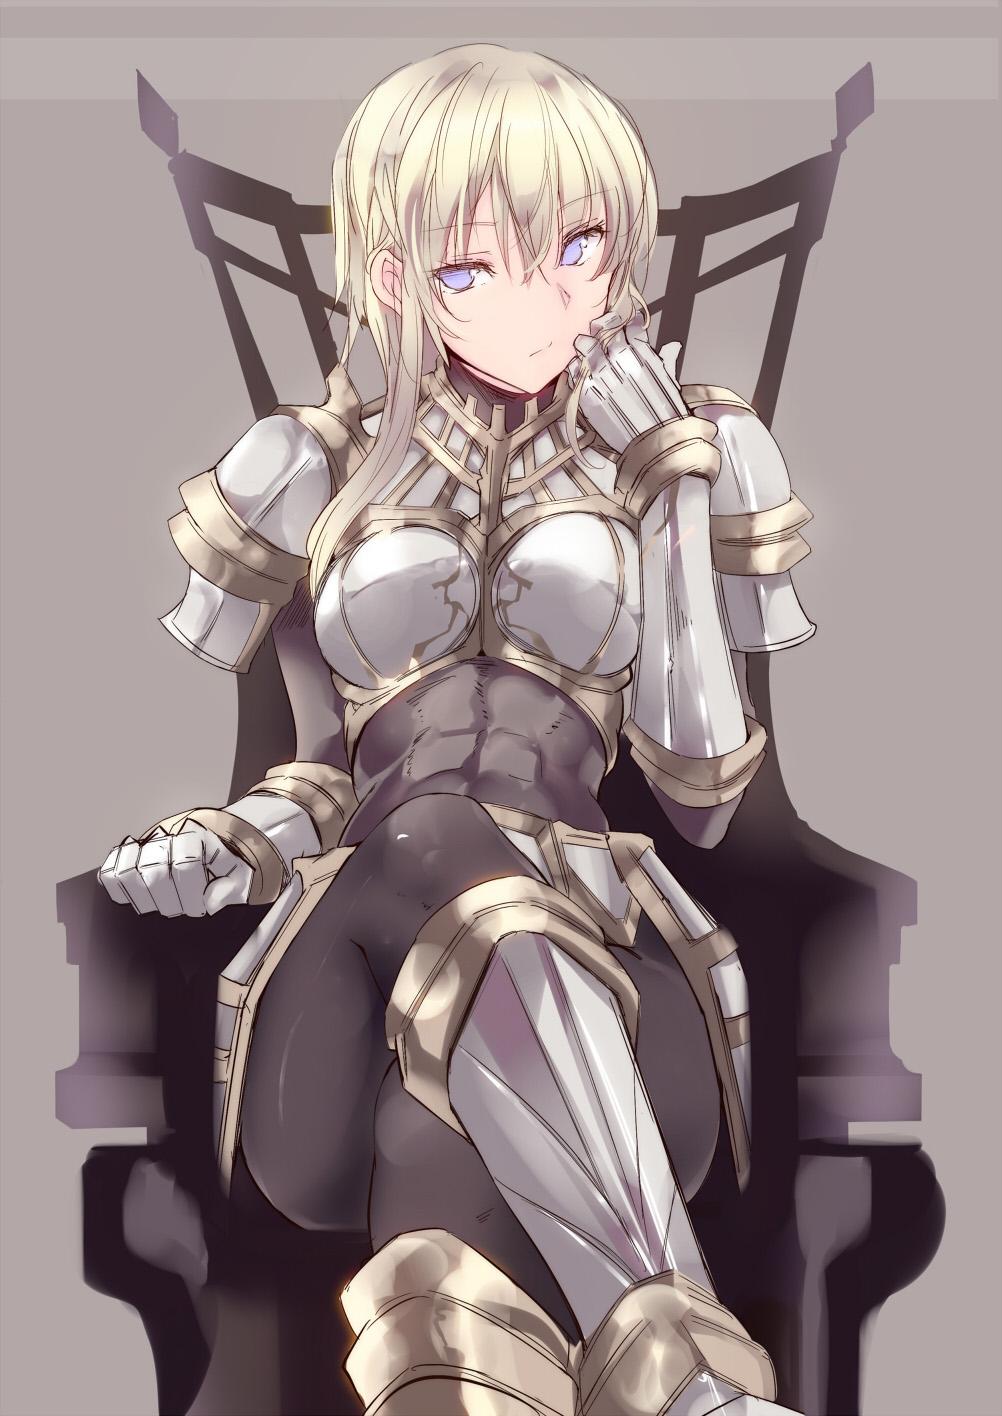 Girl knight anime clips